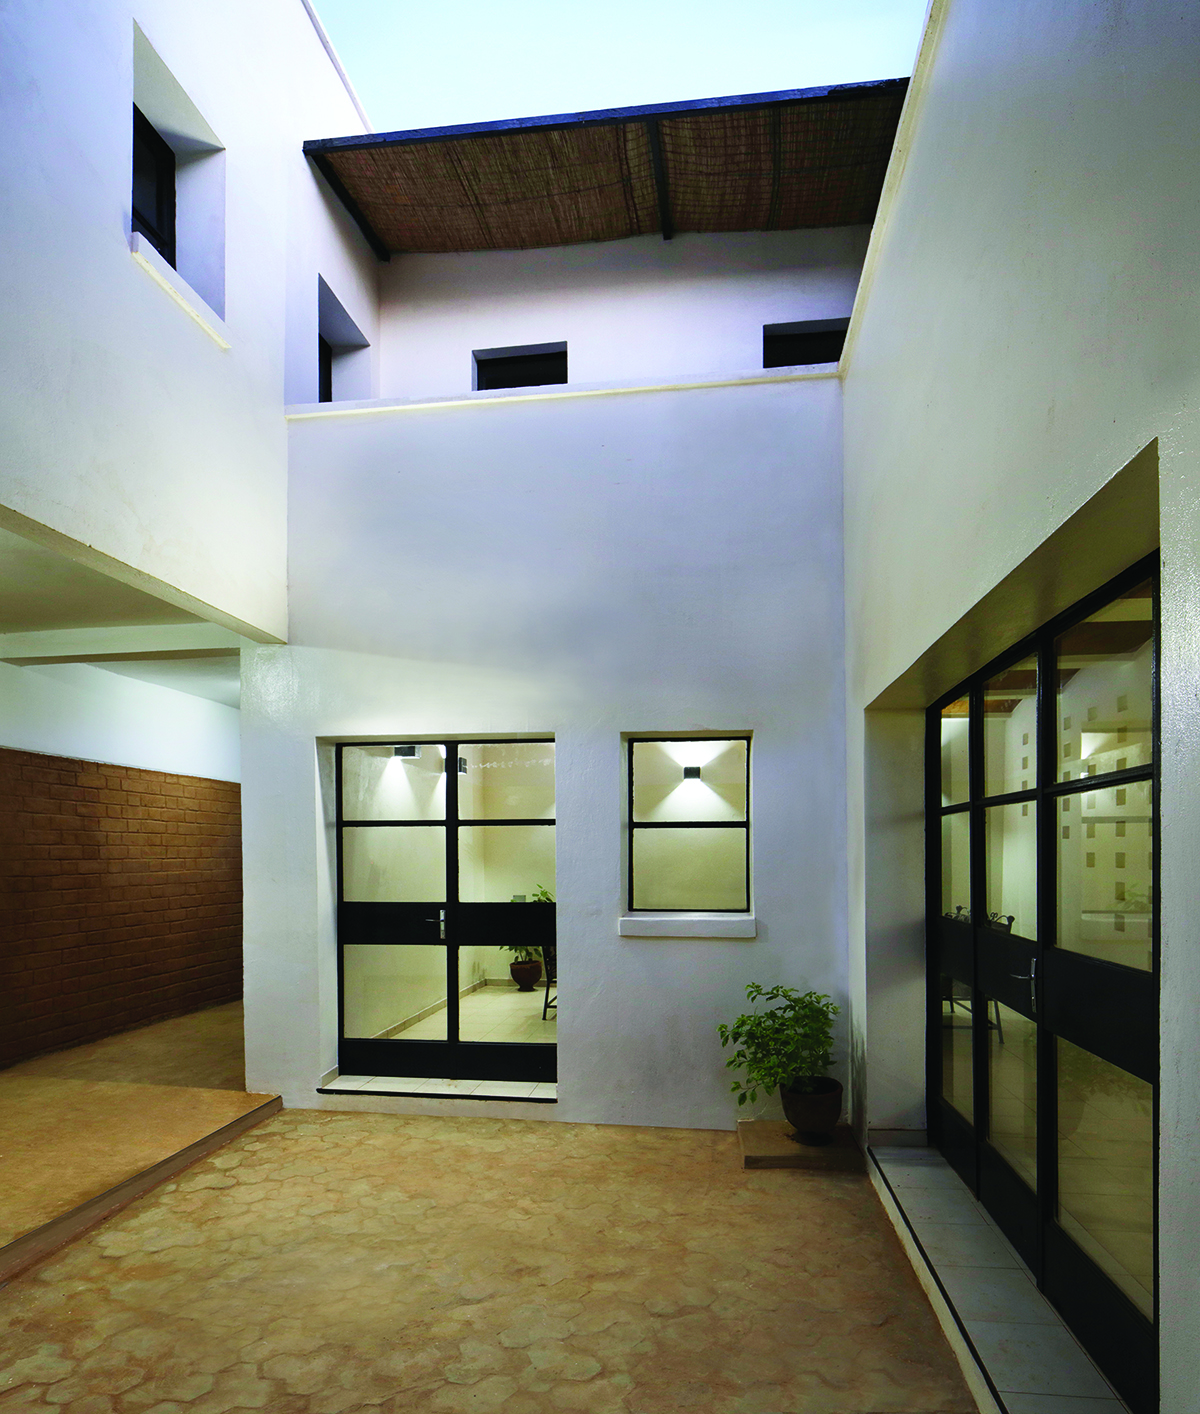 Courtyard living©united4design sm.jpg